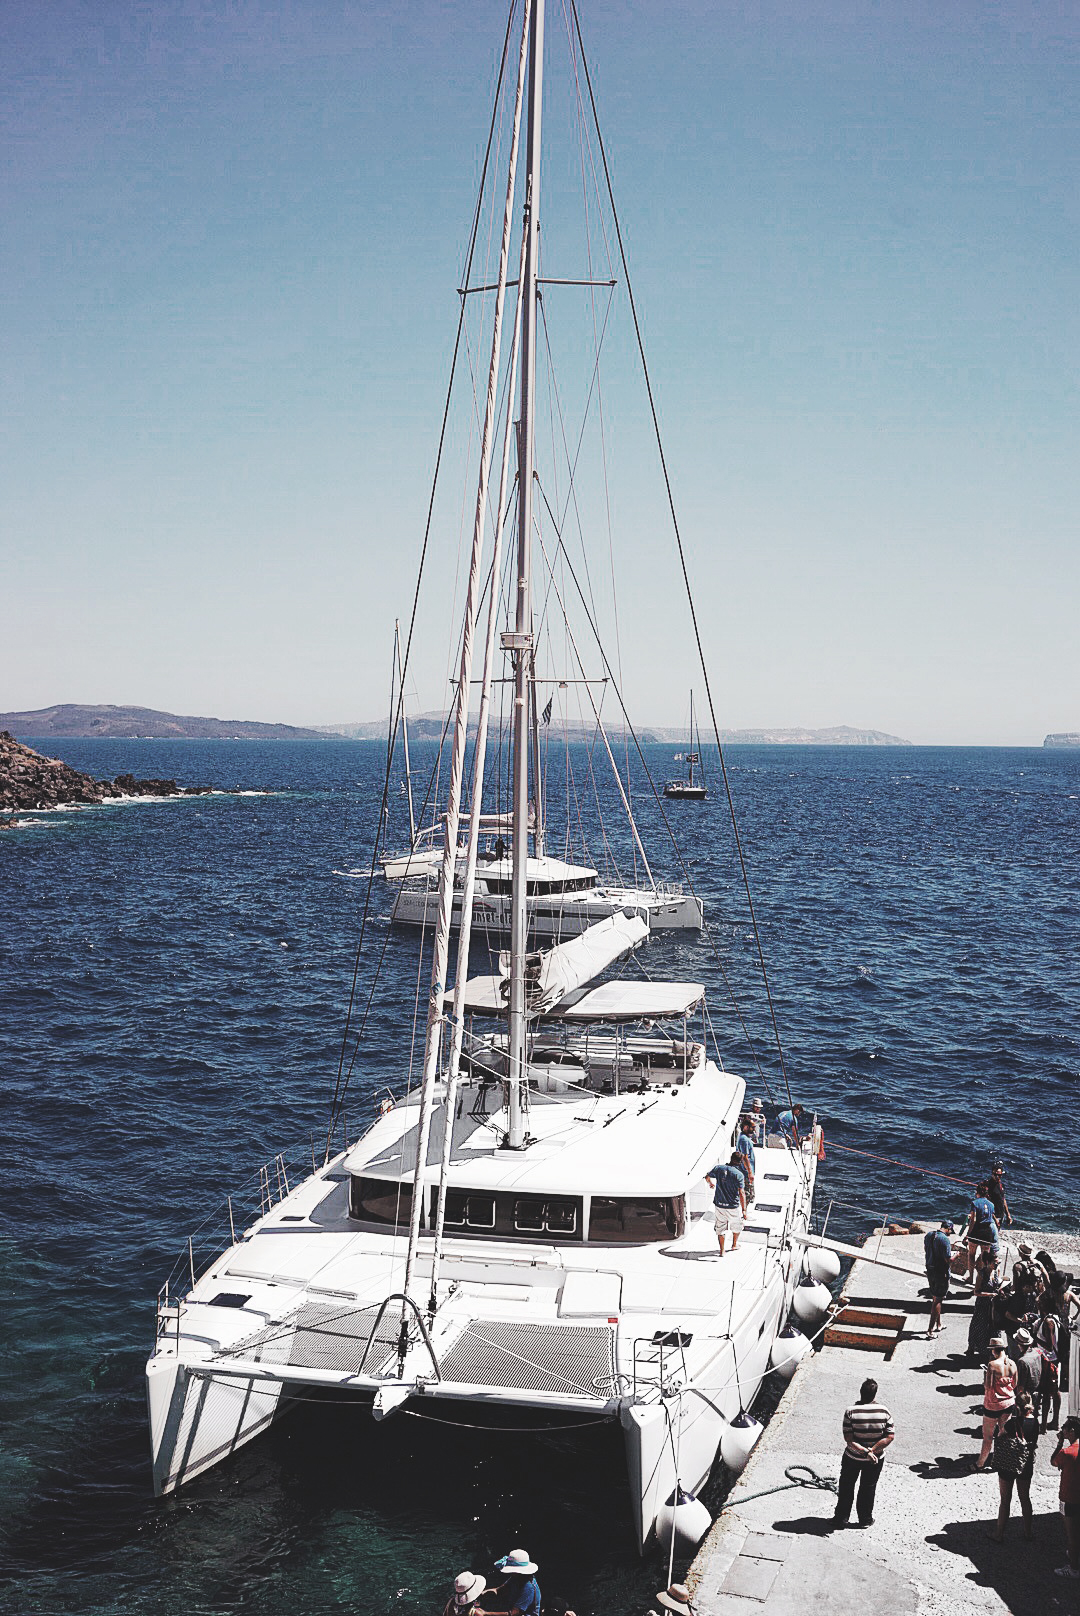 Soludos_Escapes-Boat_Trip-Bikini-Summer_Look-Santorini_Greece-GRLFRND_Jeans-Off_The_Shoulders-Collage_Vintage-Street_Style-Soludos_Espadrilles-40